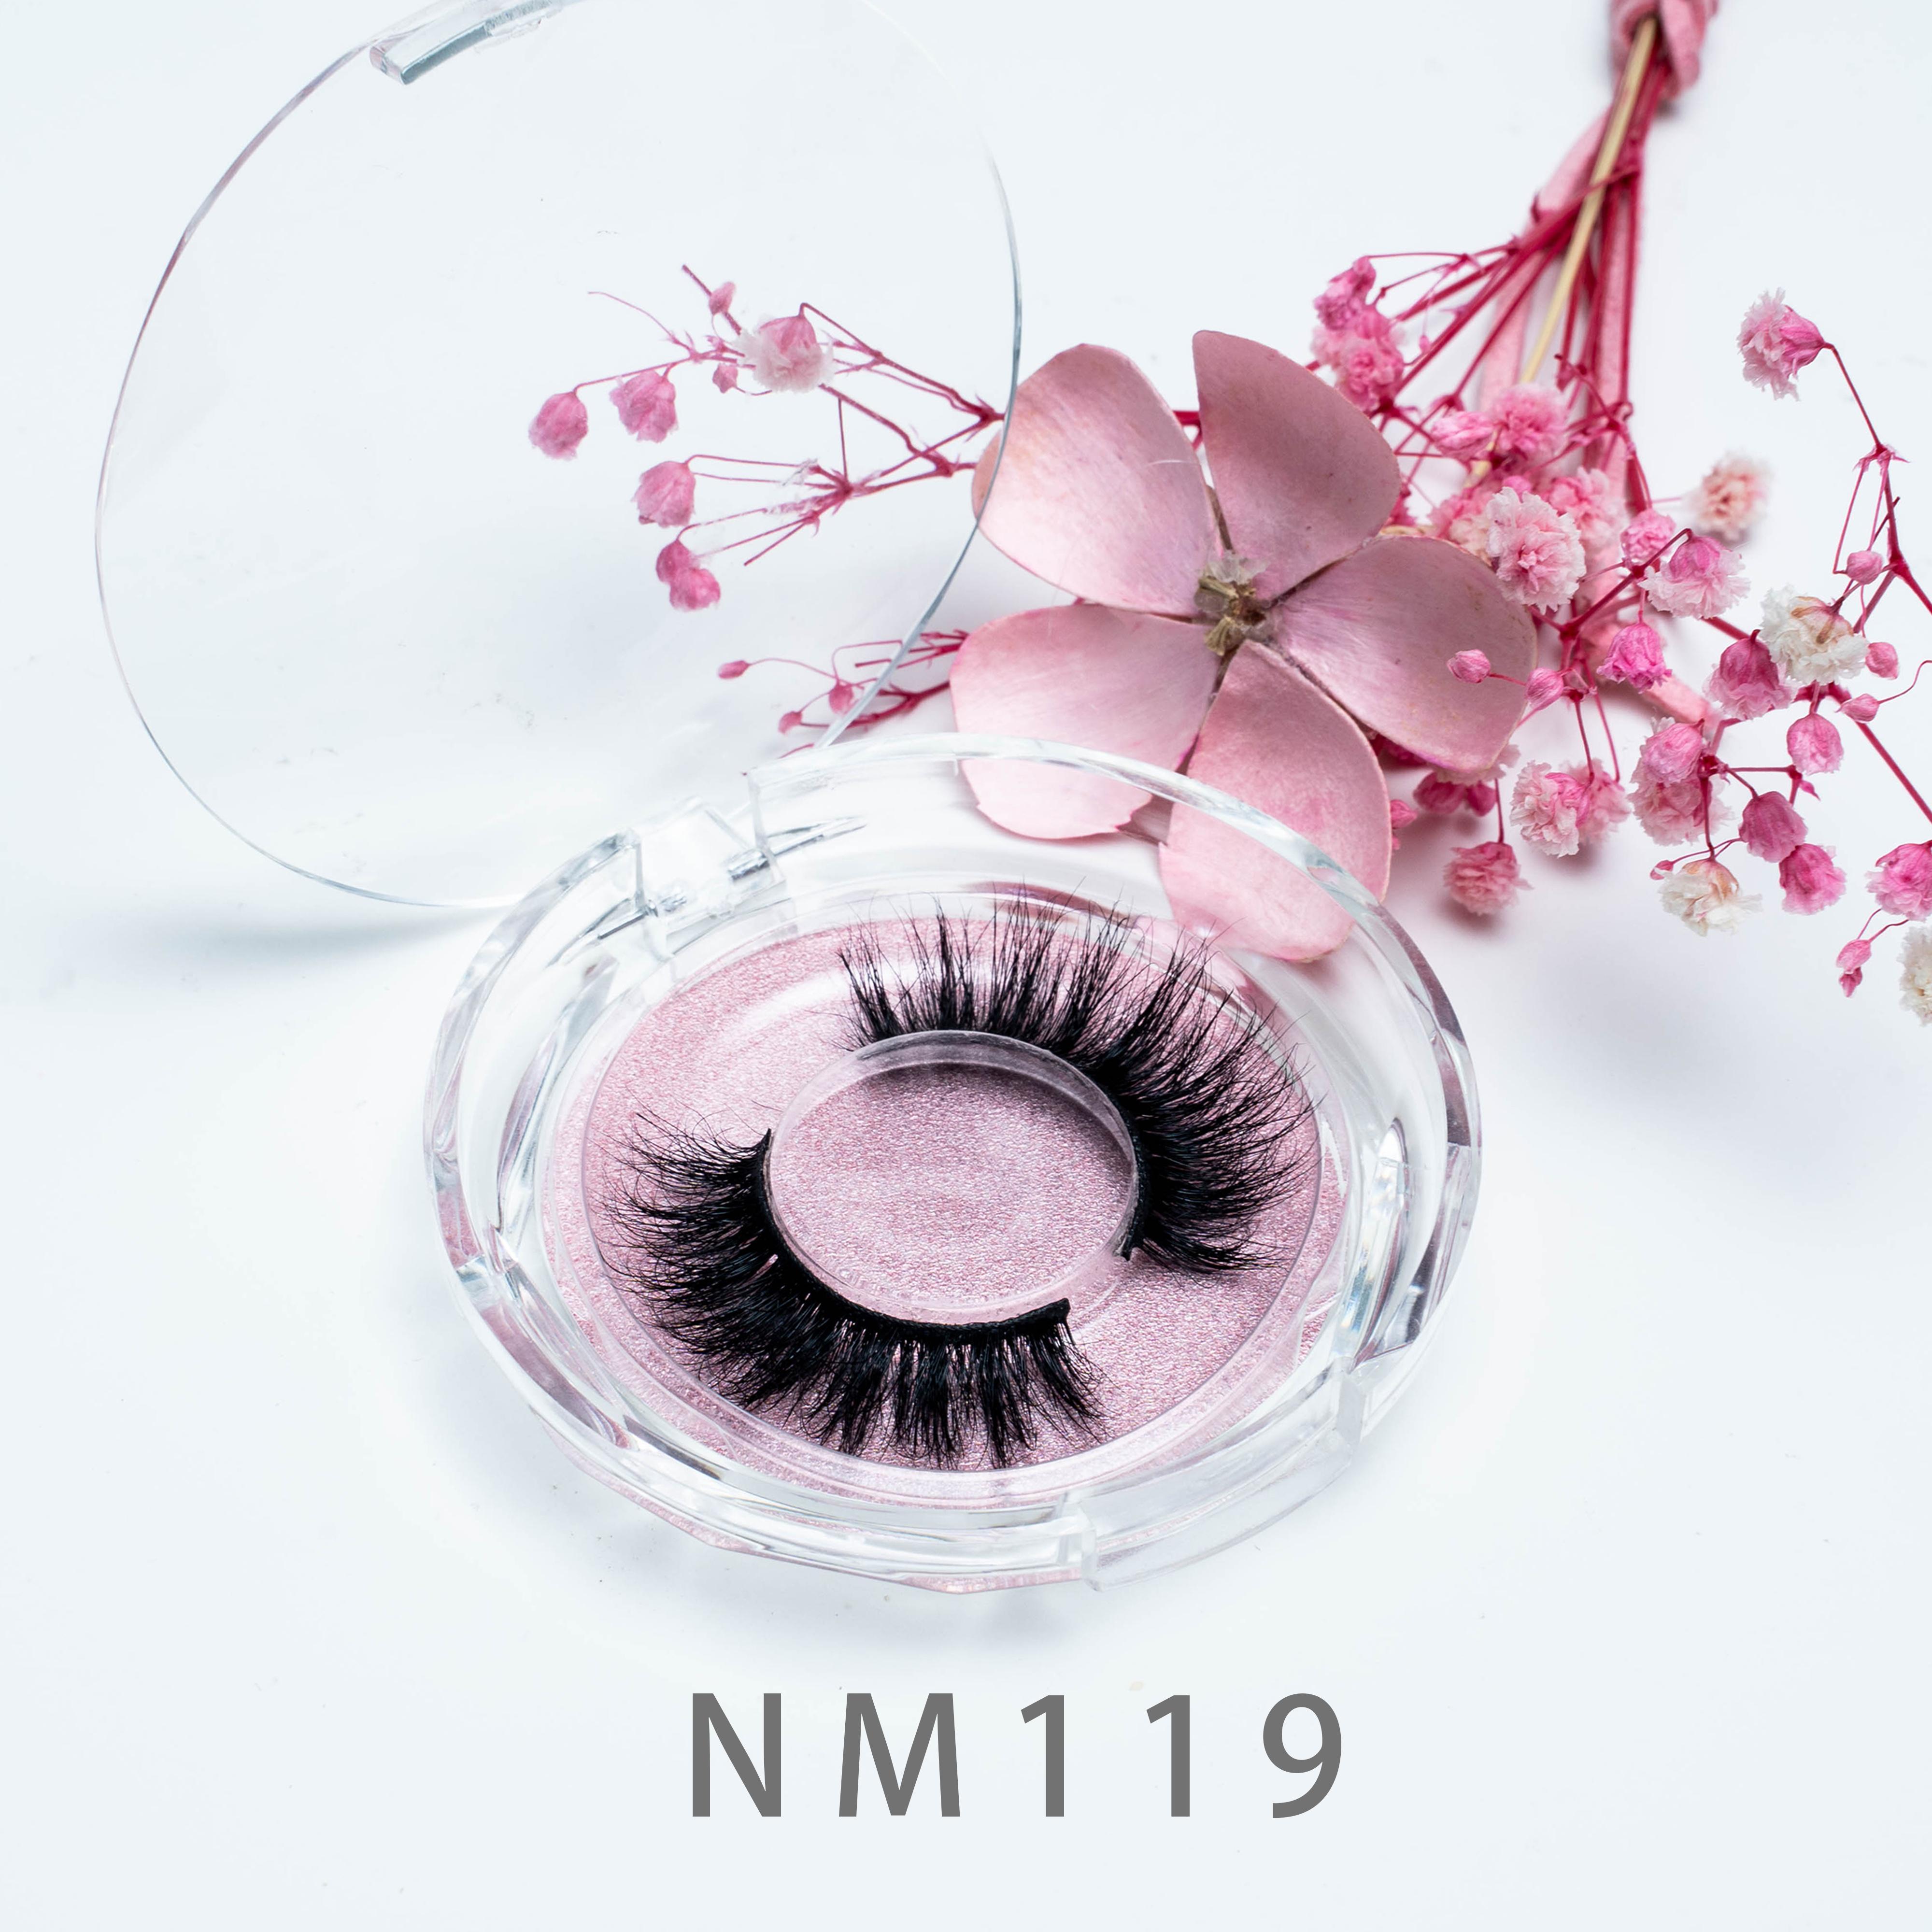 [Mink falsche Wimpern-NM119] Großhandel Wimpern 20 mm False Wimpern Dicke Streifen Mink Wimpern Makeup Lange Nerz Wimpern